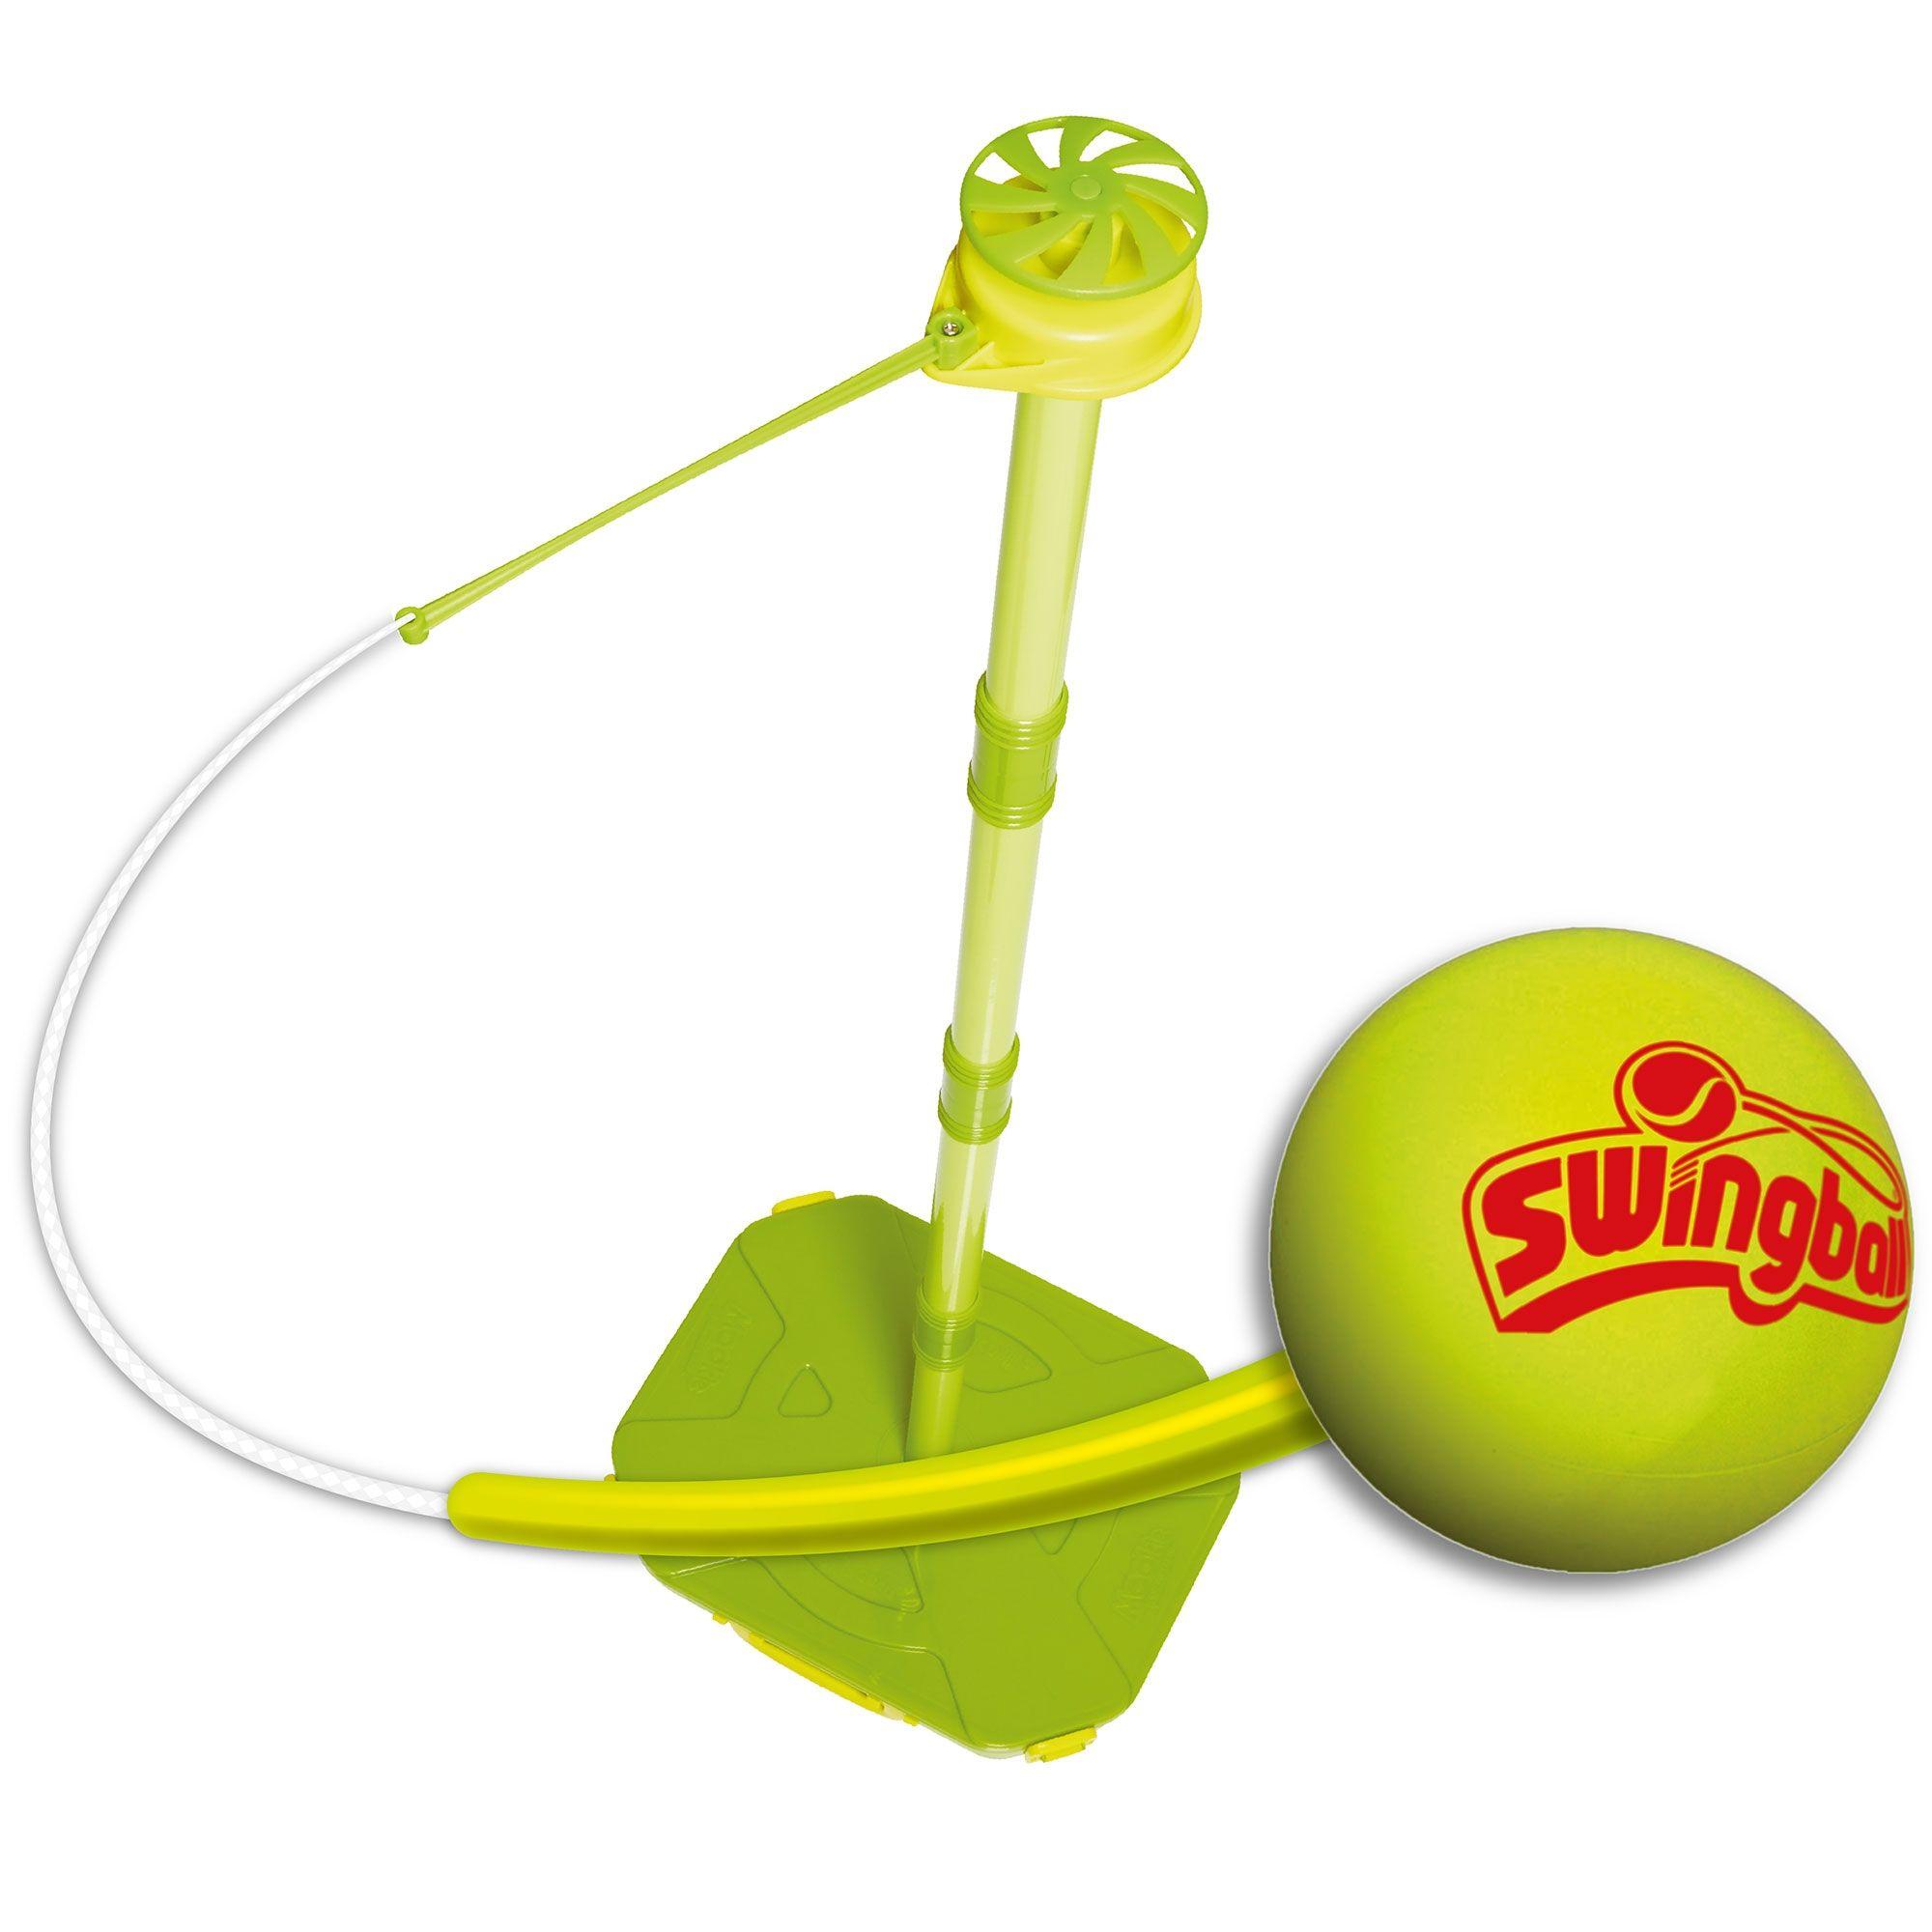 Swingball - Early fun All surface Junior